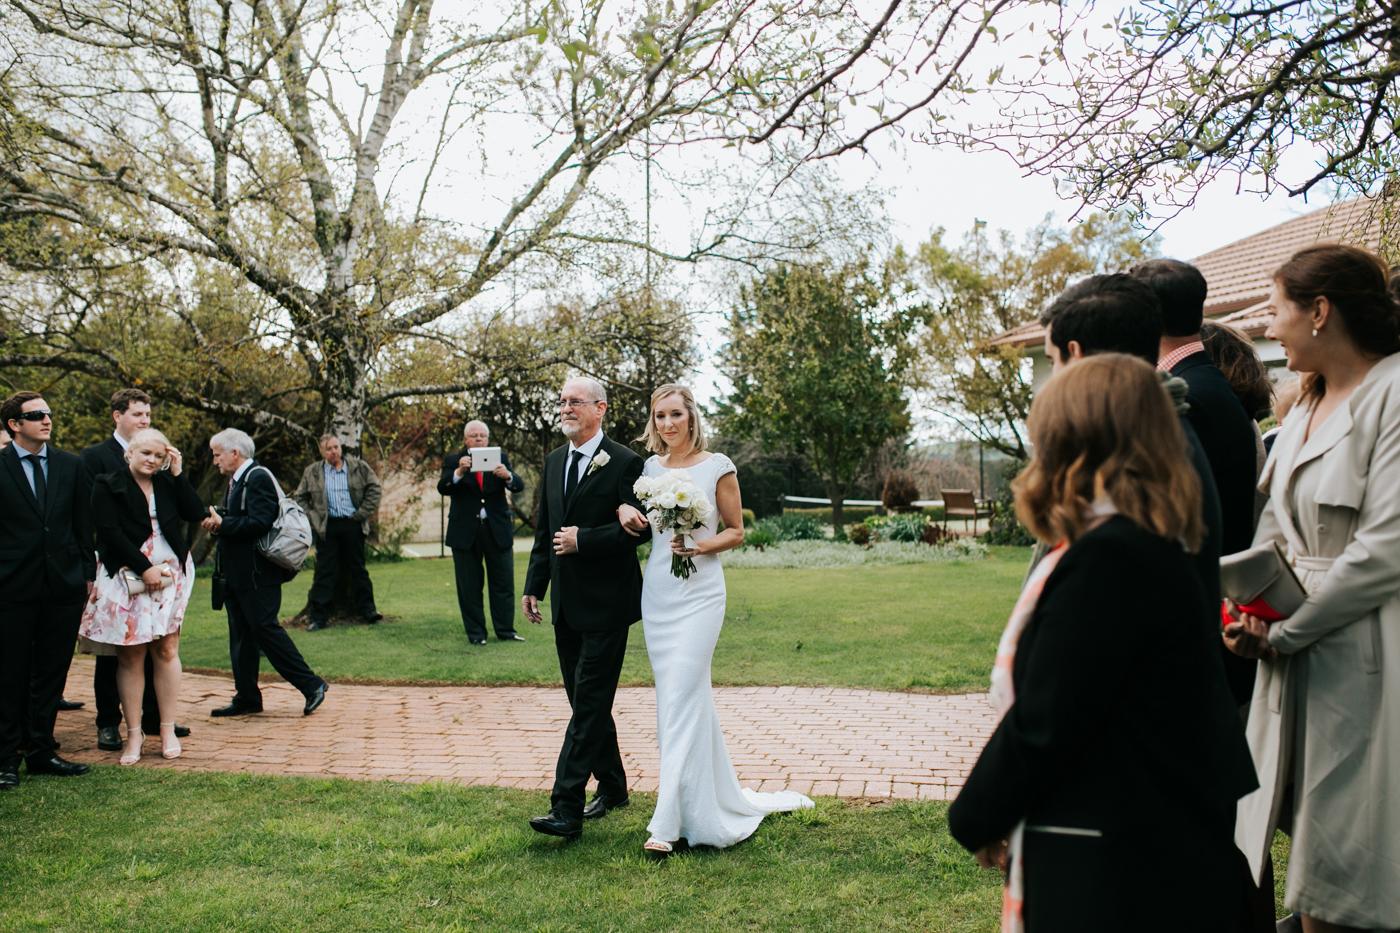 Bridget & James - Orange Country Wedding - Samantha Heather Photography-25.jpg